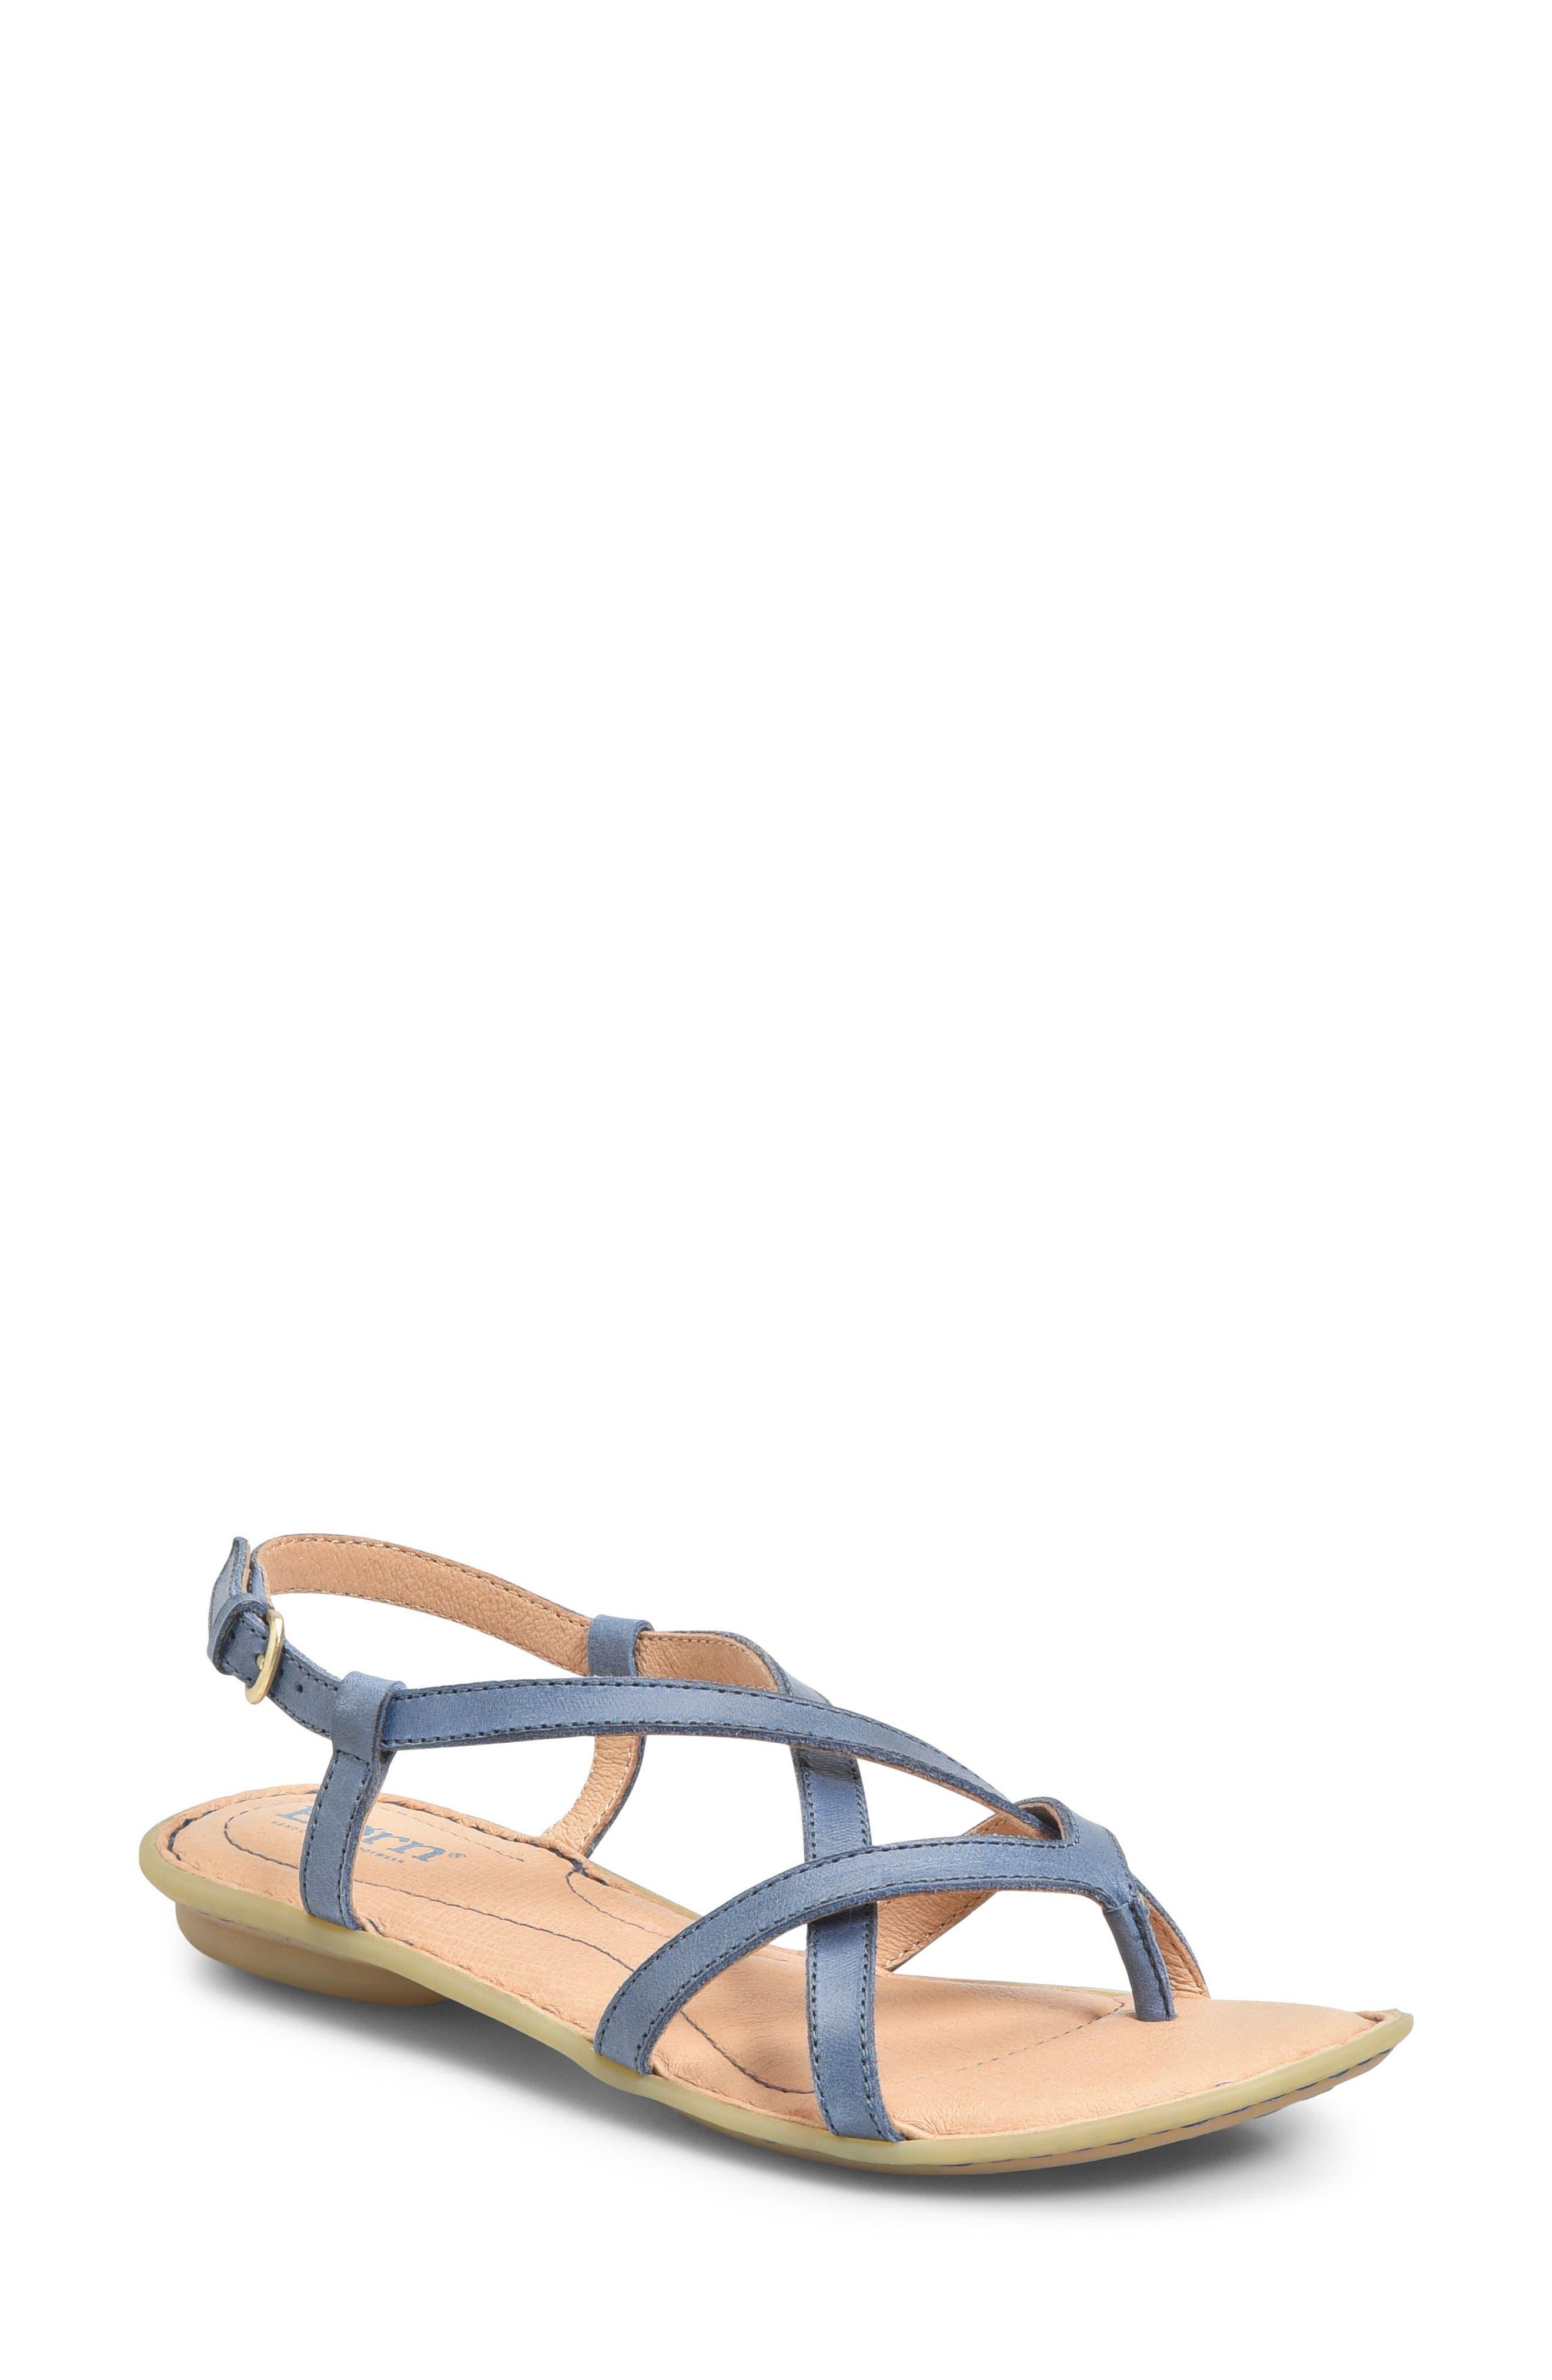 Mai Strap Sandal,                         Main,                         color, Navy Leather